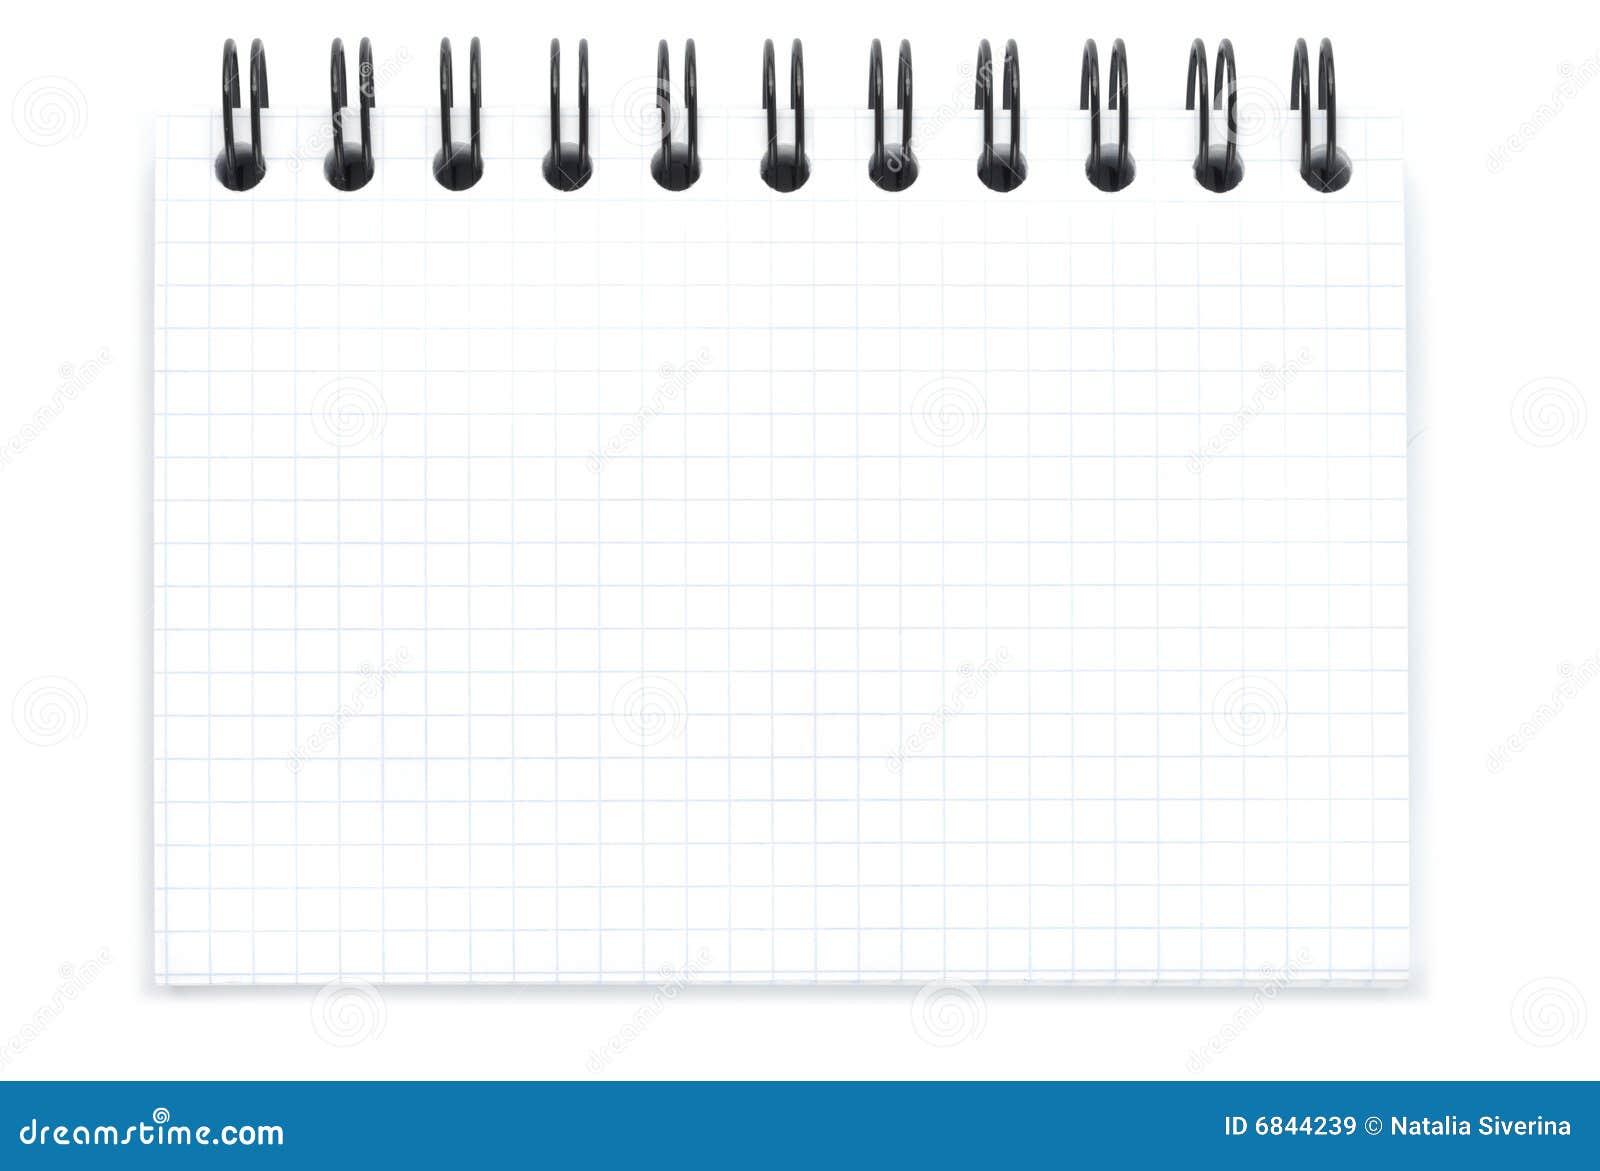 Libreta De Hojas Blancas De Dibujo Jpg By Gianferdinand: Blank Spiral Notebook Stock Image. Image Of Book, Path